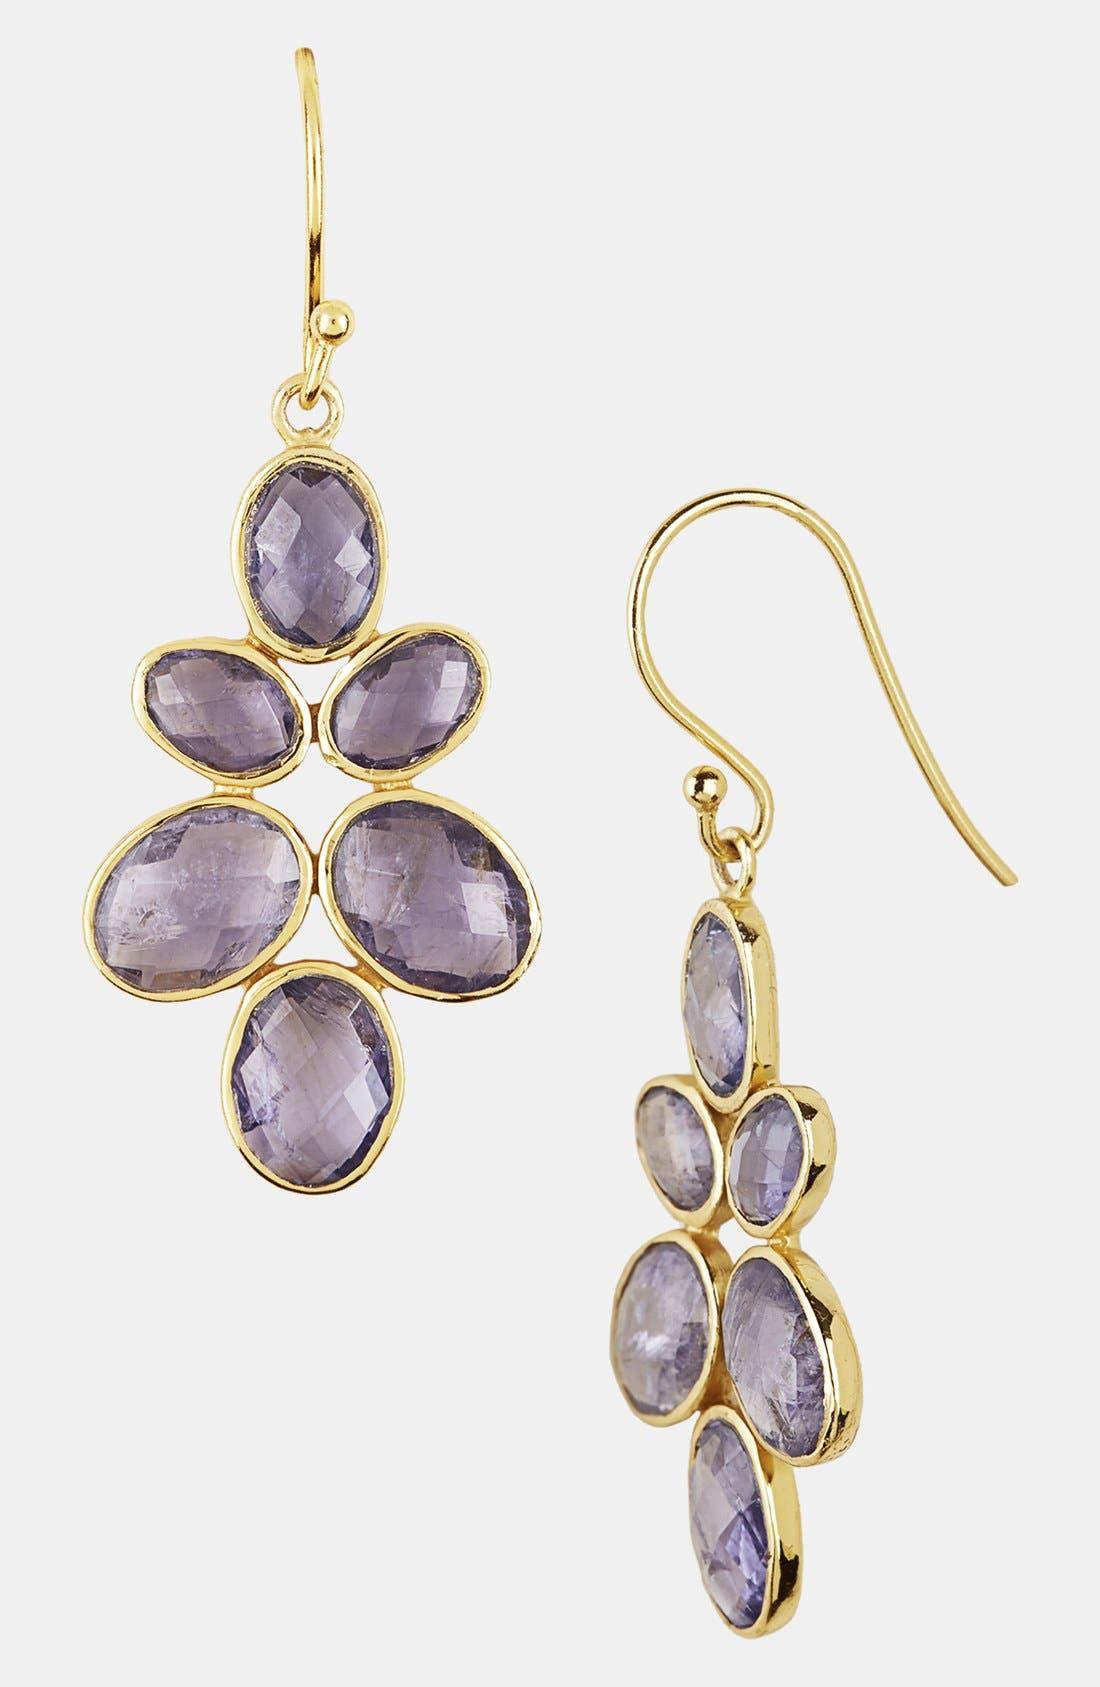 Alternate Image 1 Selected - Argento Vivo Cluster Drop Earrings